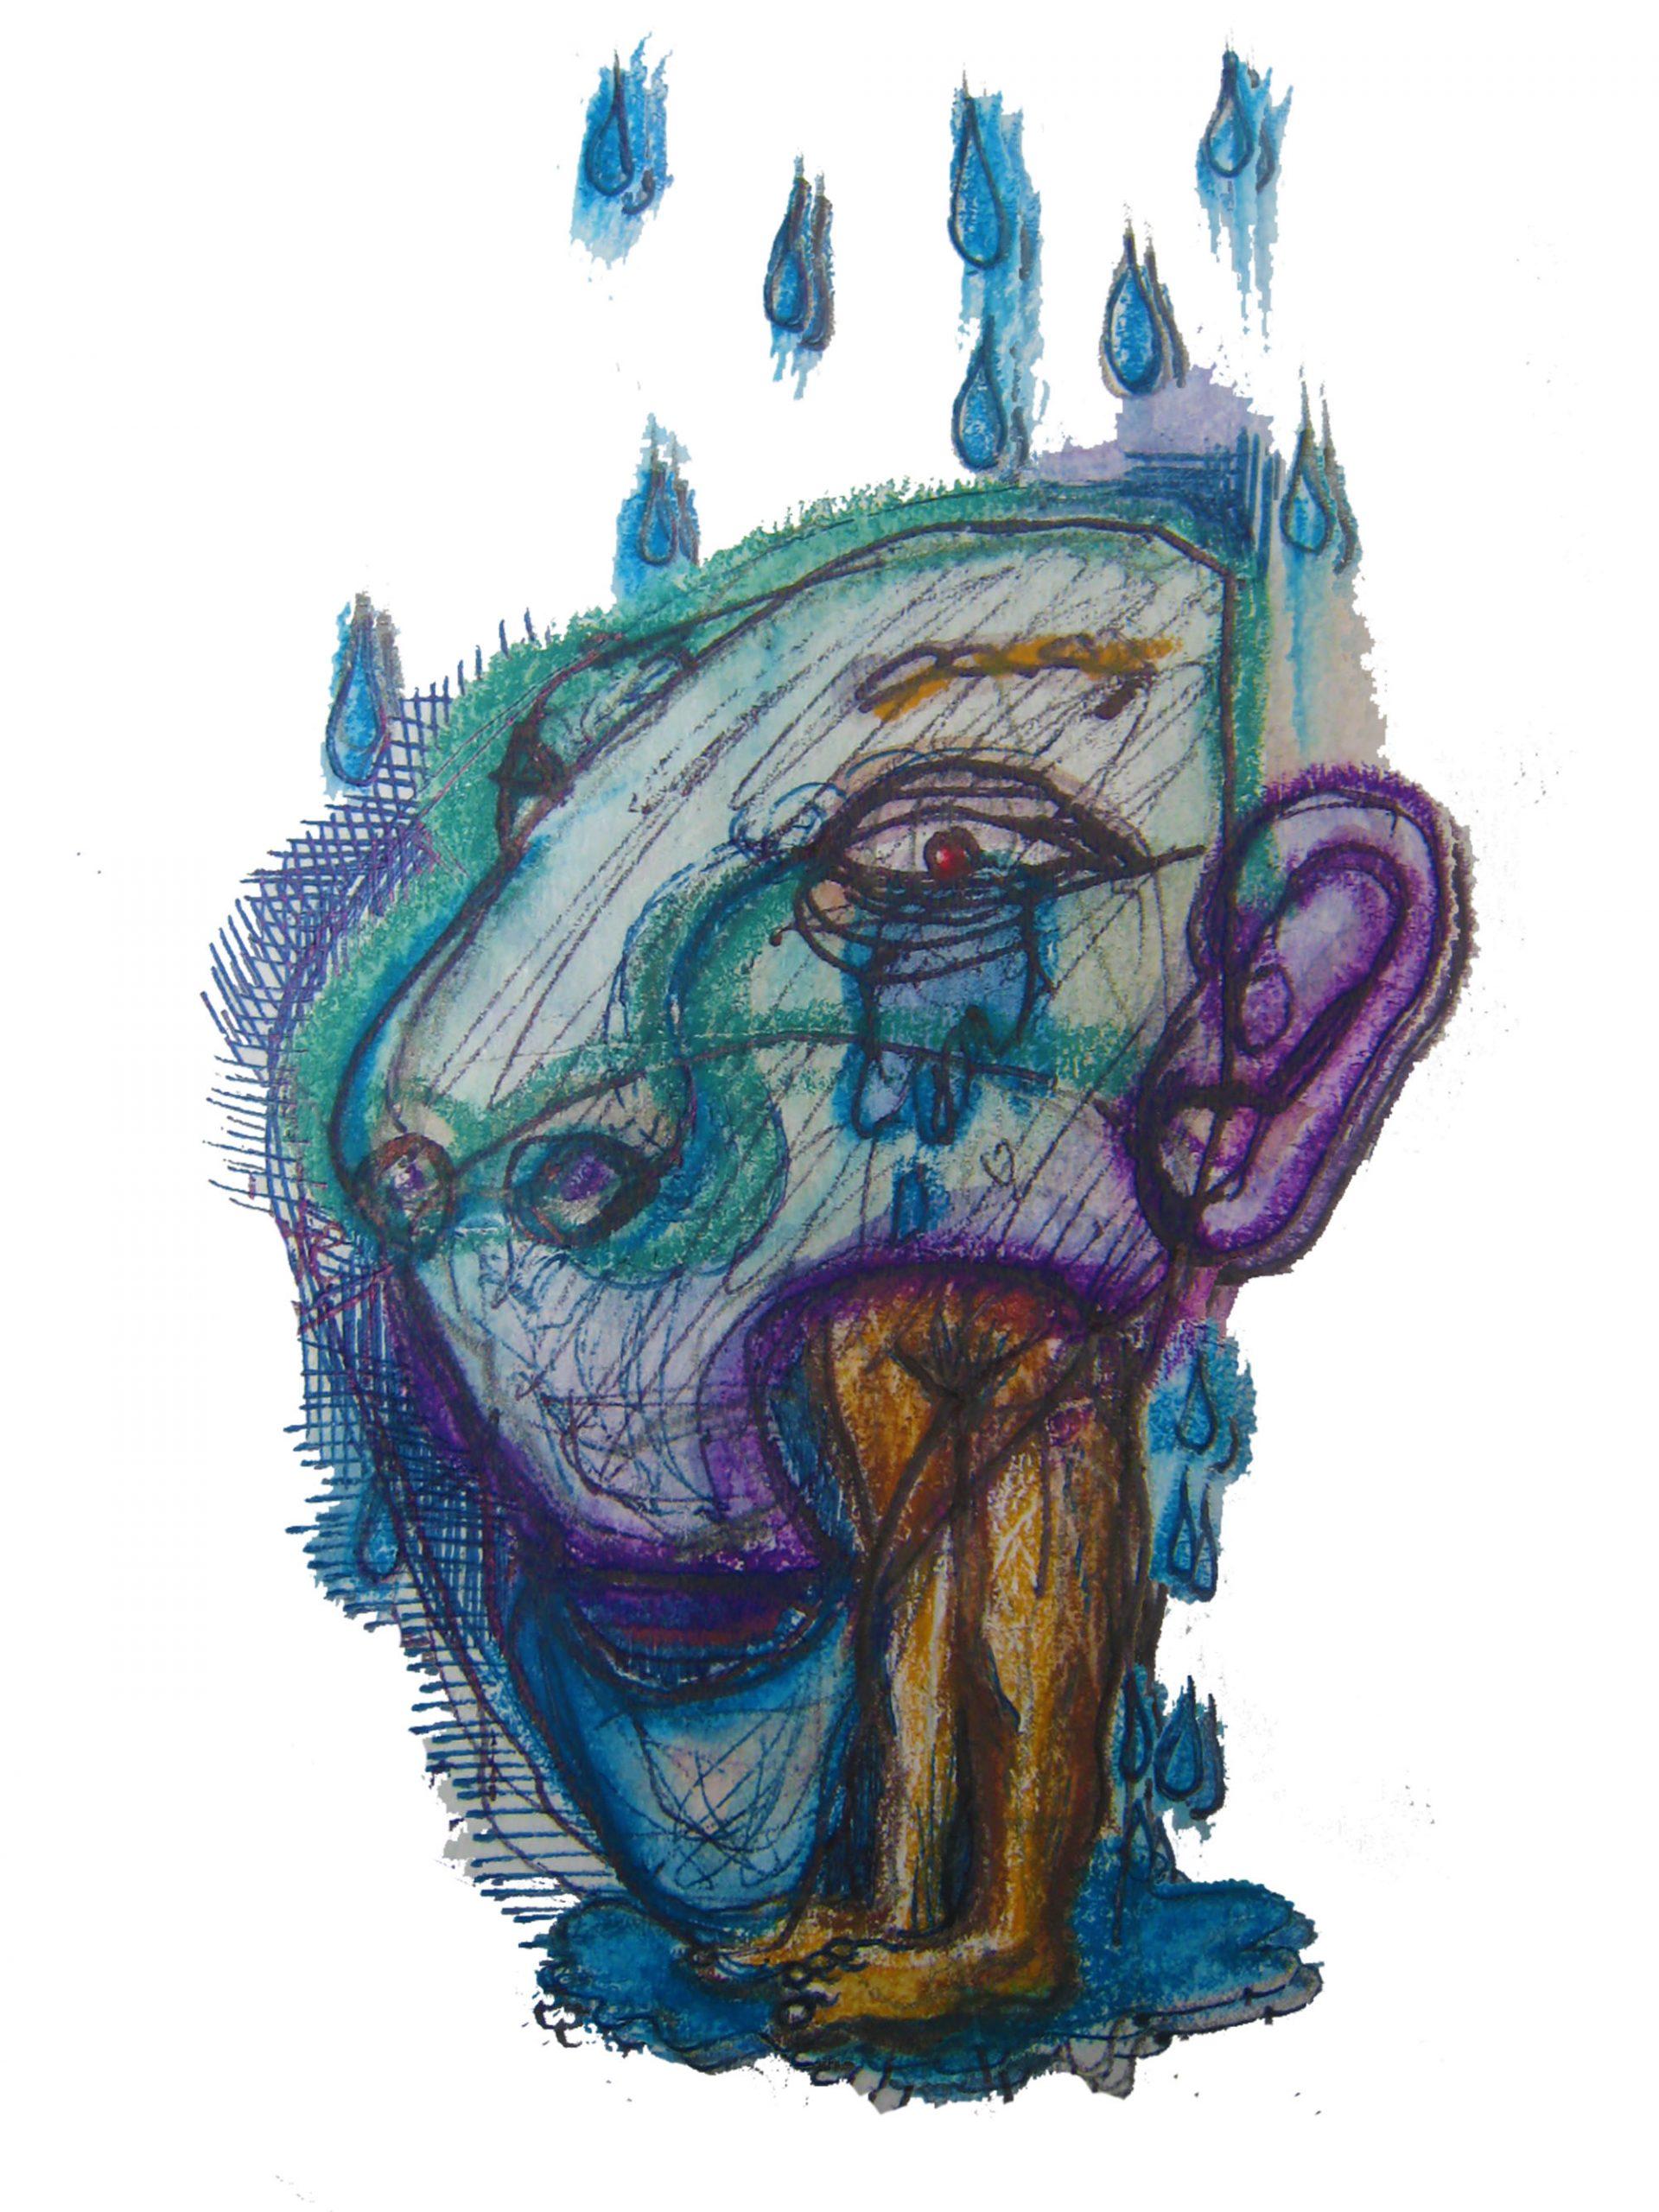 Minah Lee's Home Squat Home illustration